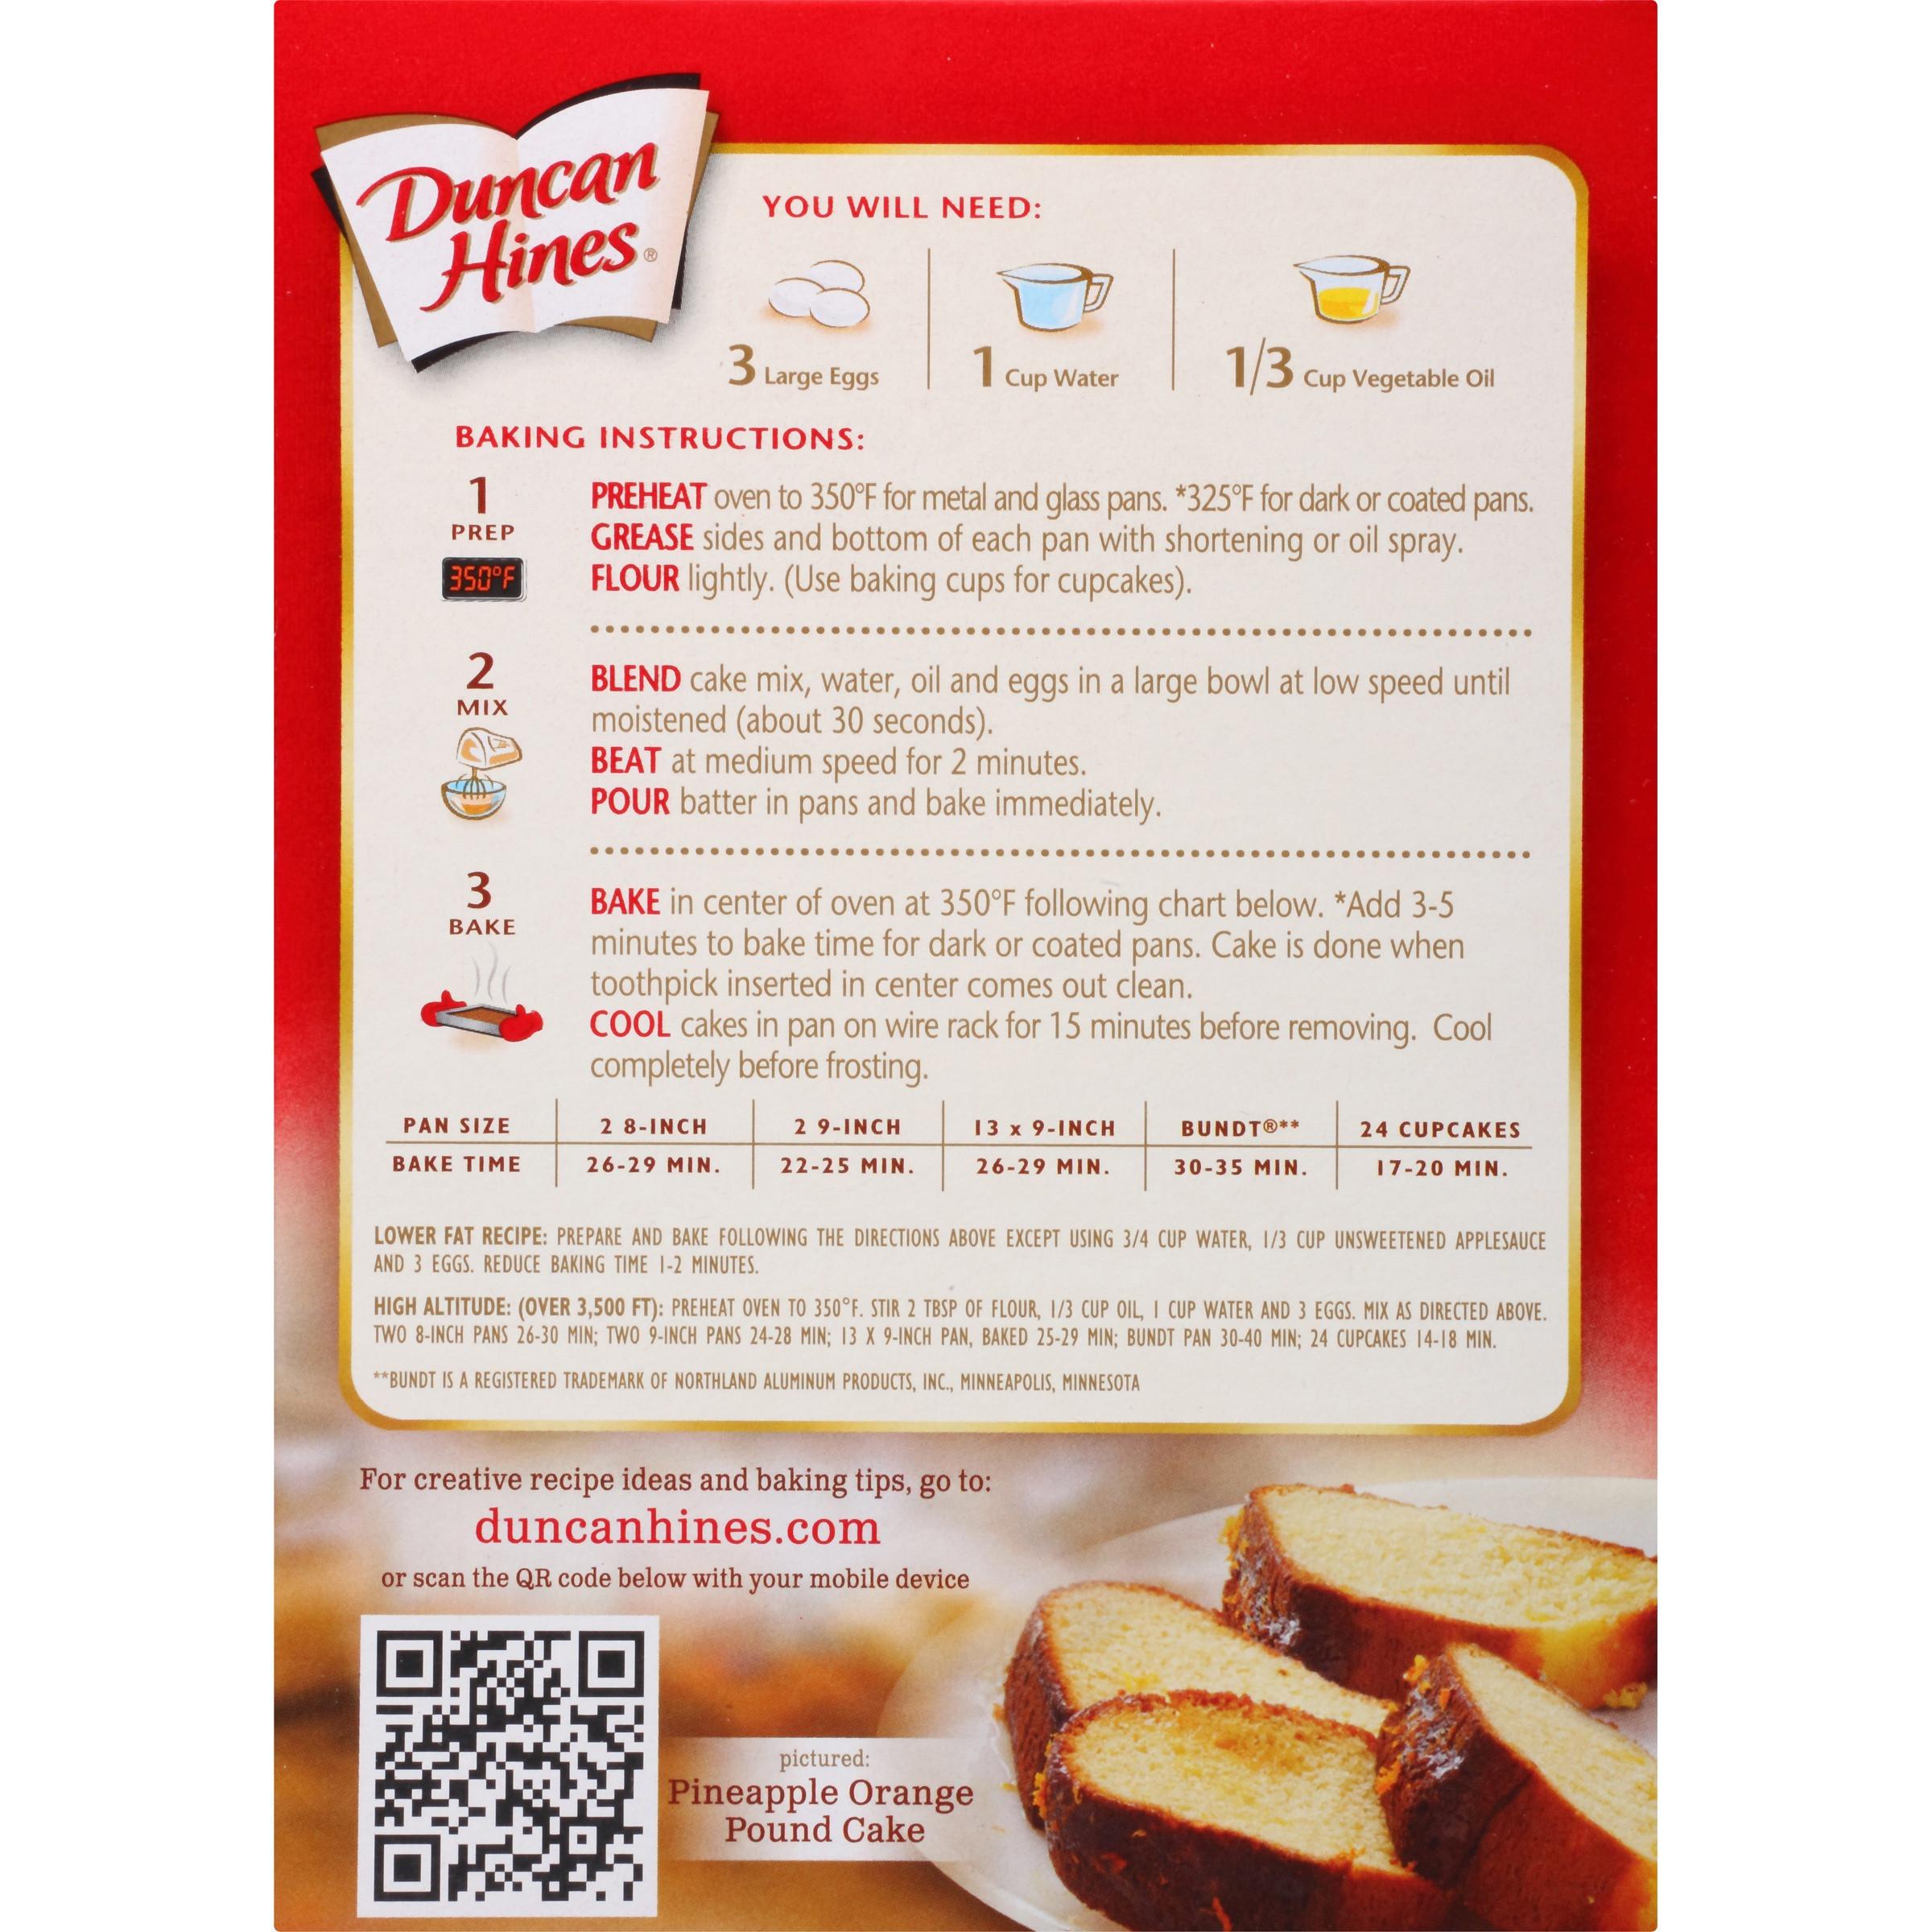 Duncan Hines Pineapple Upside Down Cake Recipe  duncan hines pineapple pound cake